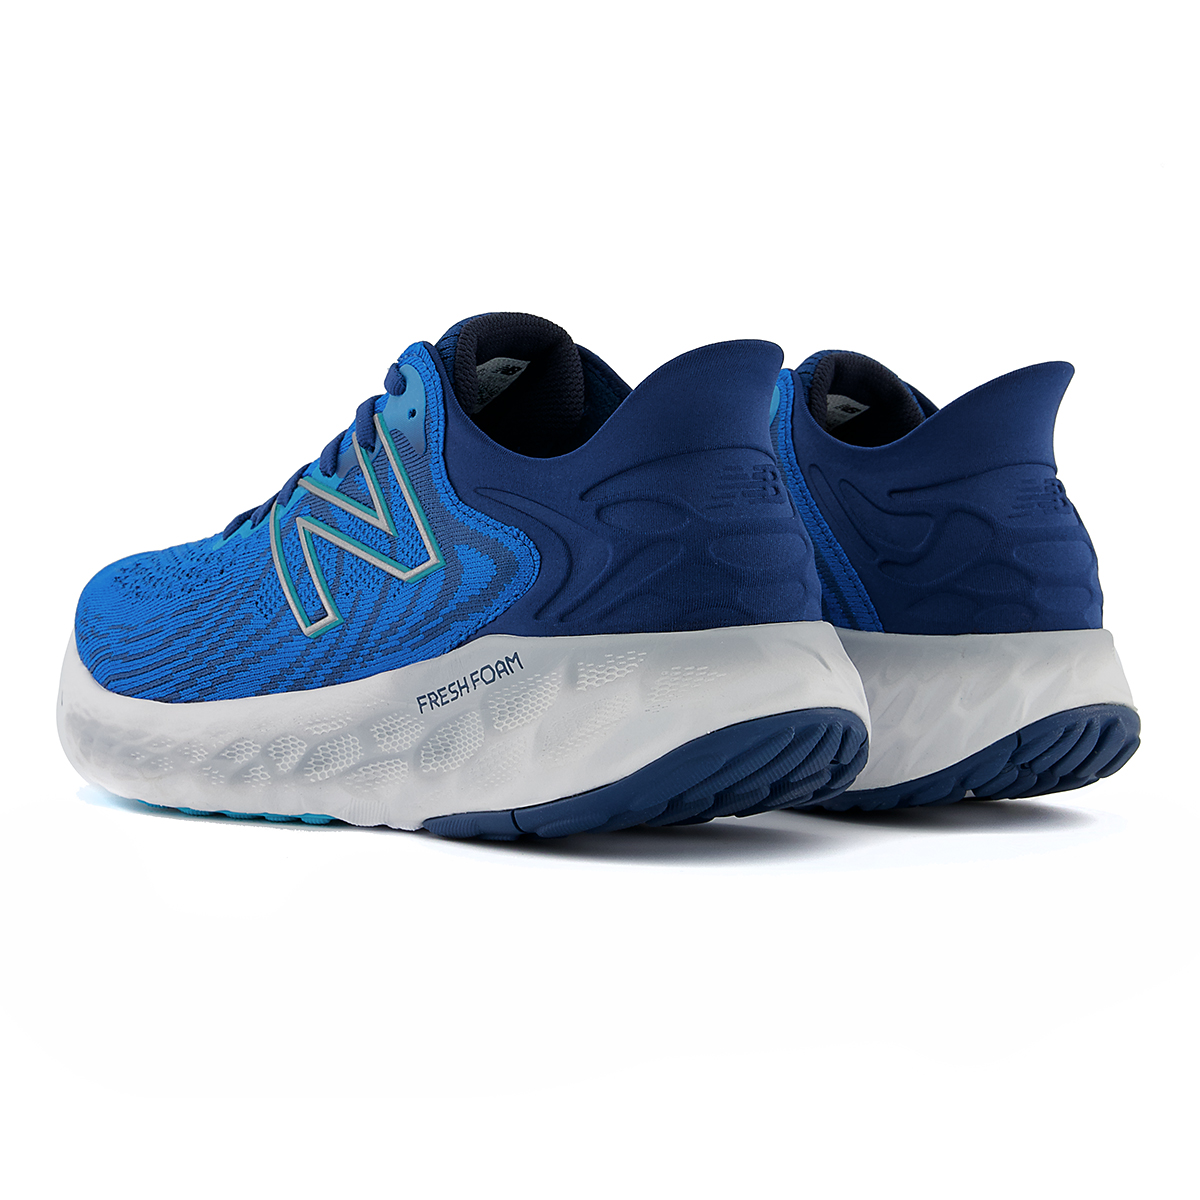 Men's New Balance Fresh Foam 1080v11 Running Shoe - Color: Wave/Light Rogue Wave - Size: 6 - Width: Wide, Wave/Light Rogue Wave, large, image 4